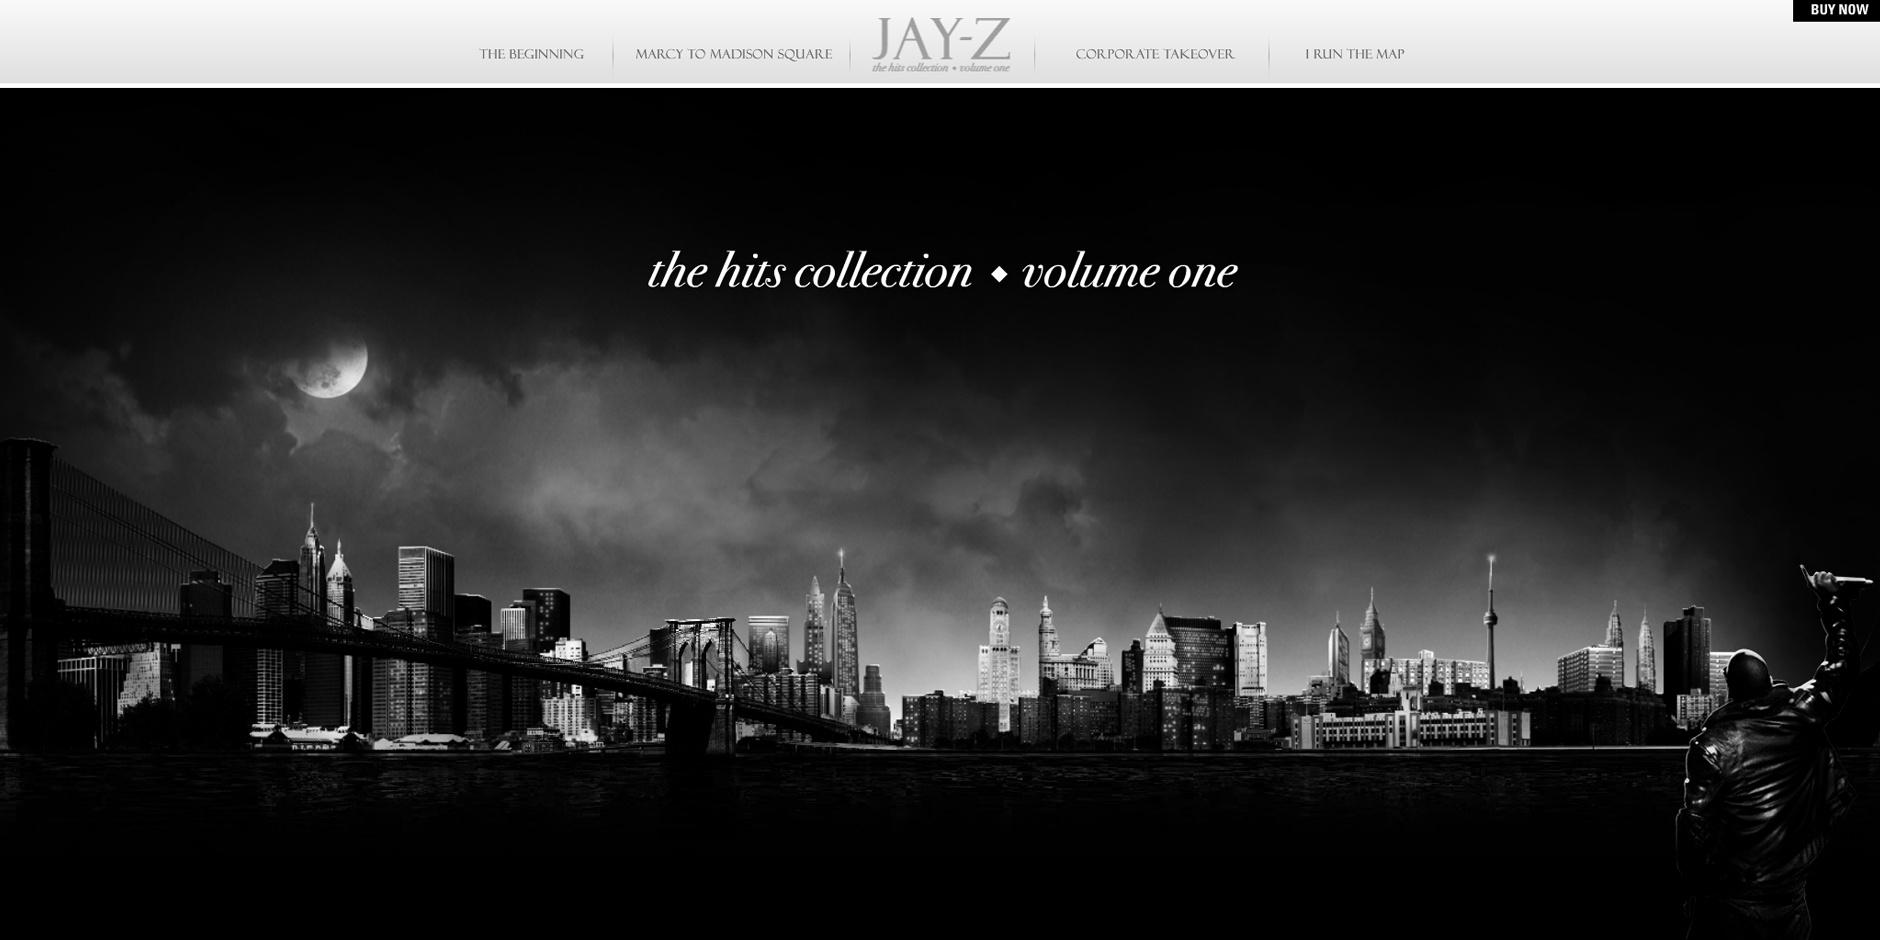 Webby Award Nominee - Jay-Z Hits Collection Vol. 1